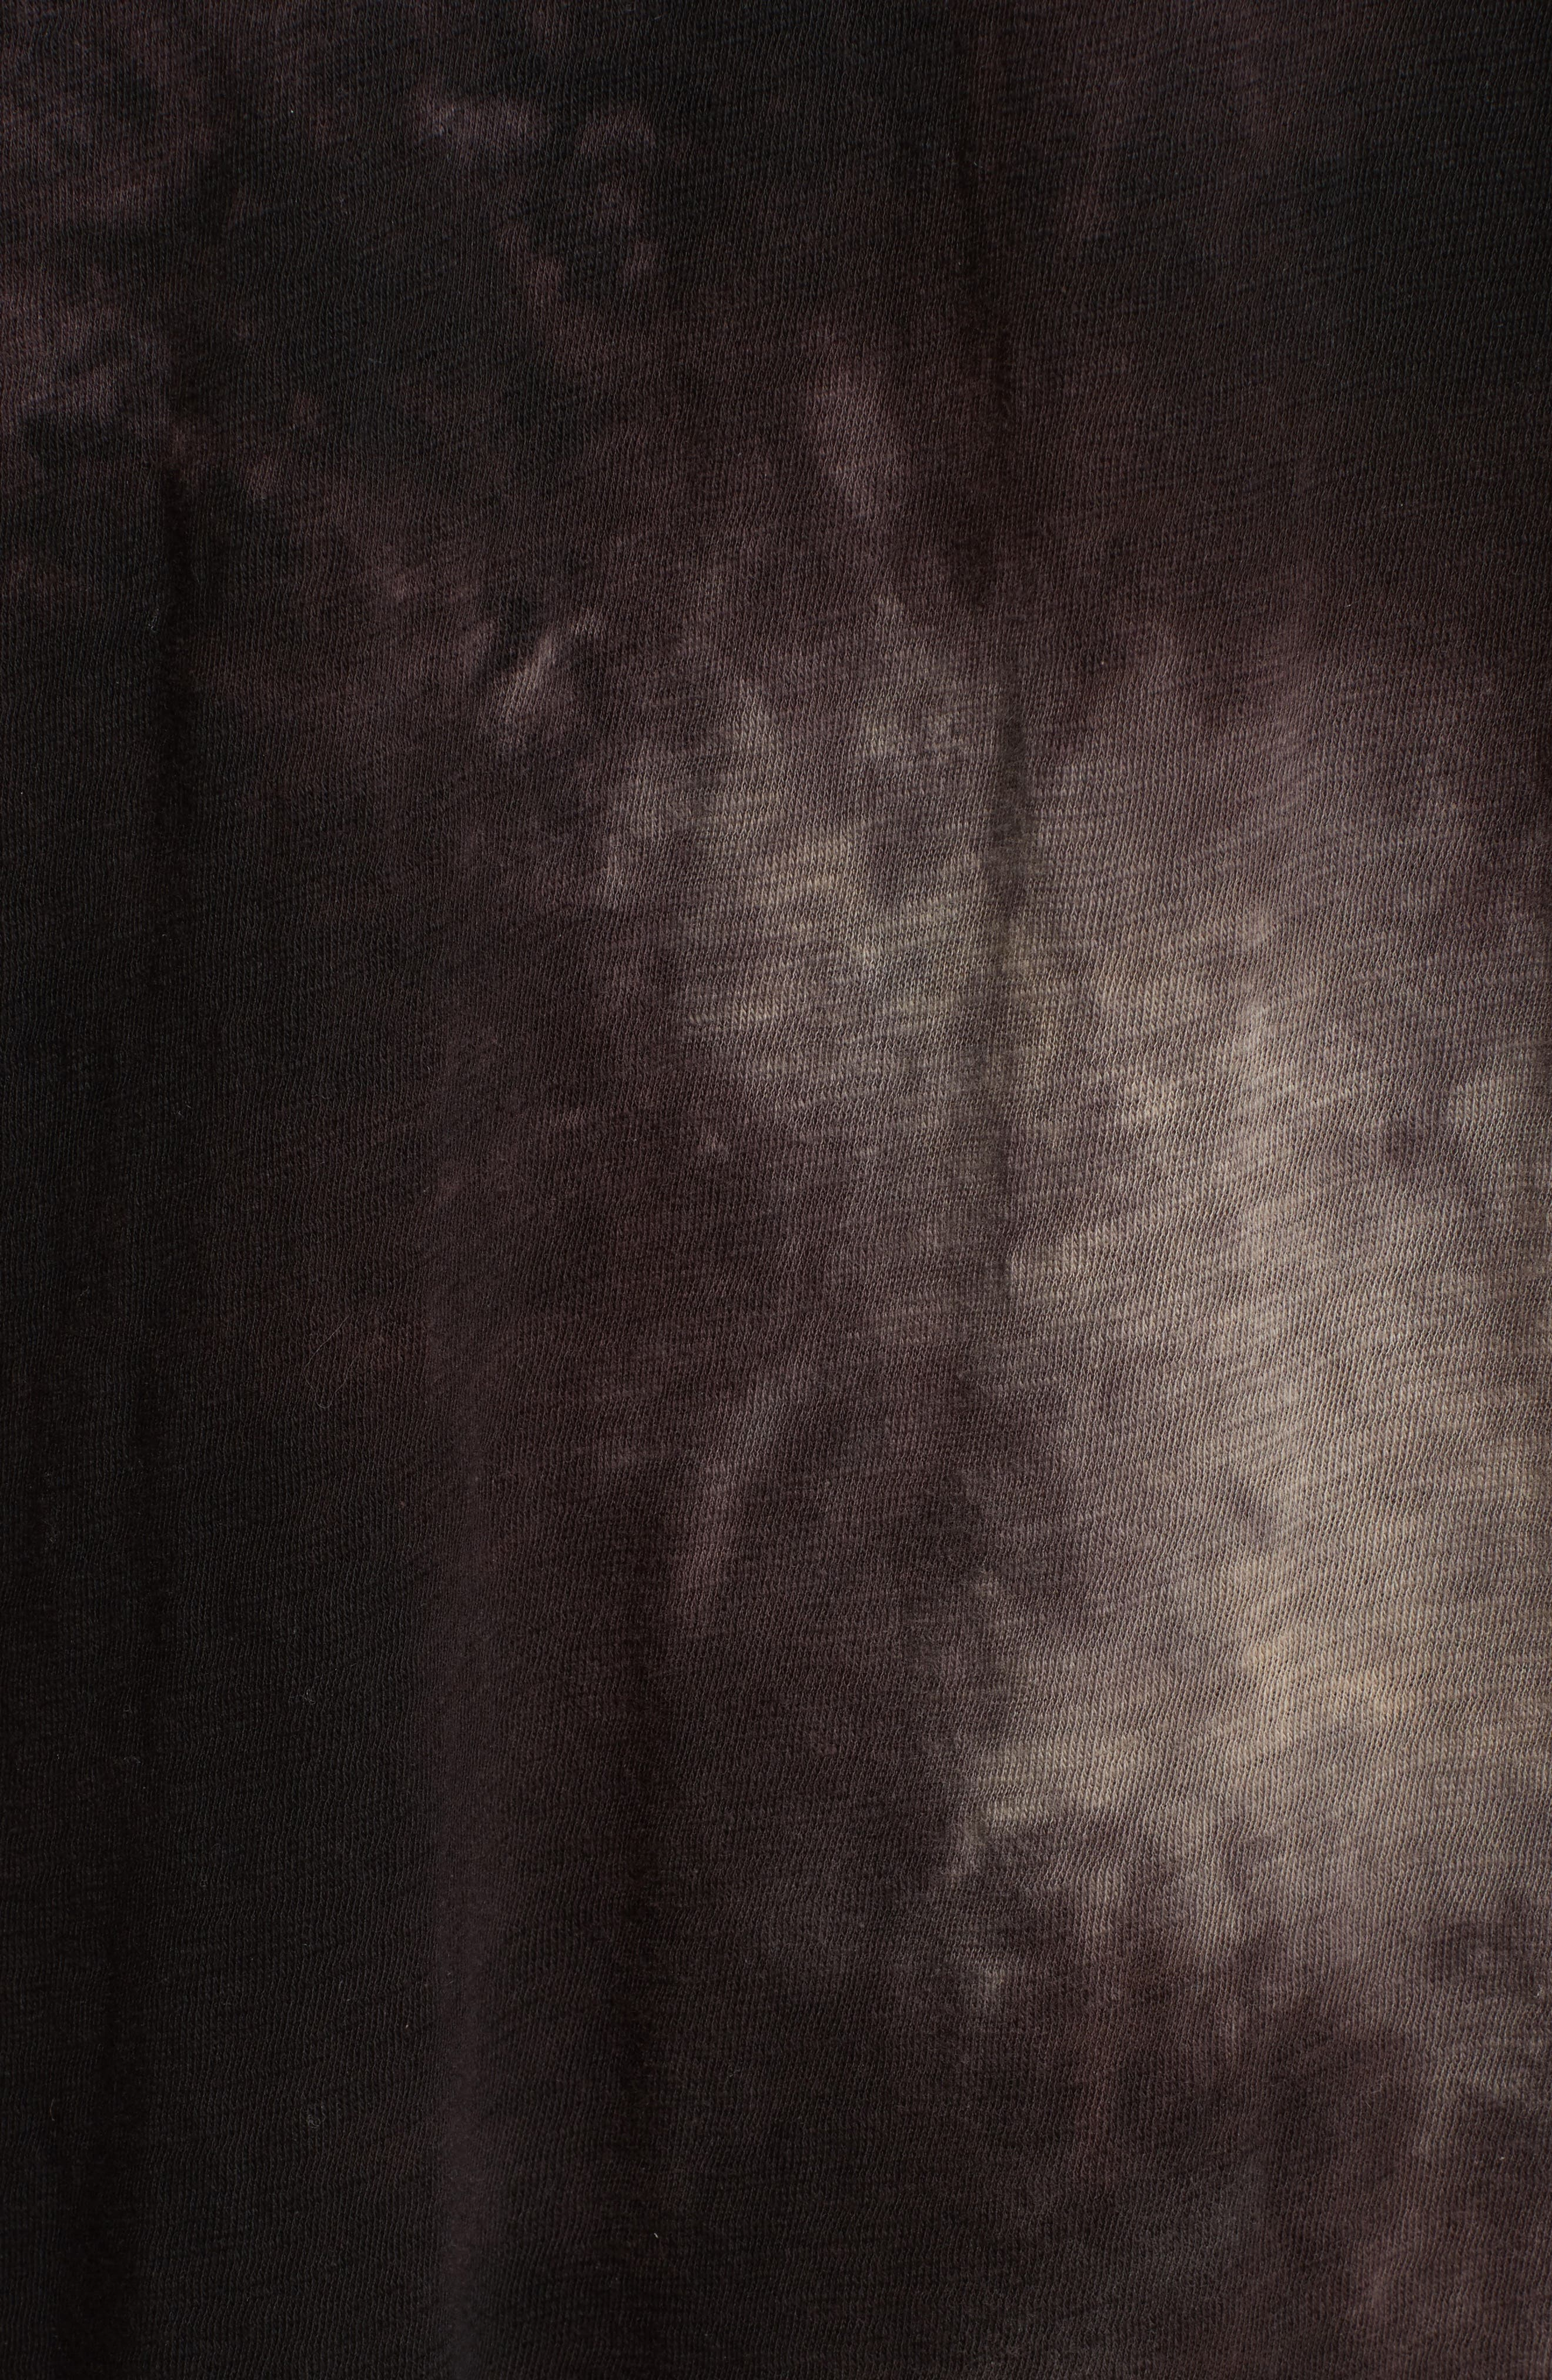 Tie Dye Jersey T-Shirt Dress,                             Alternate thumbnail 5, color,                             Black Tie Die